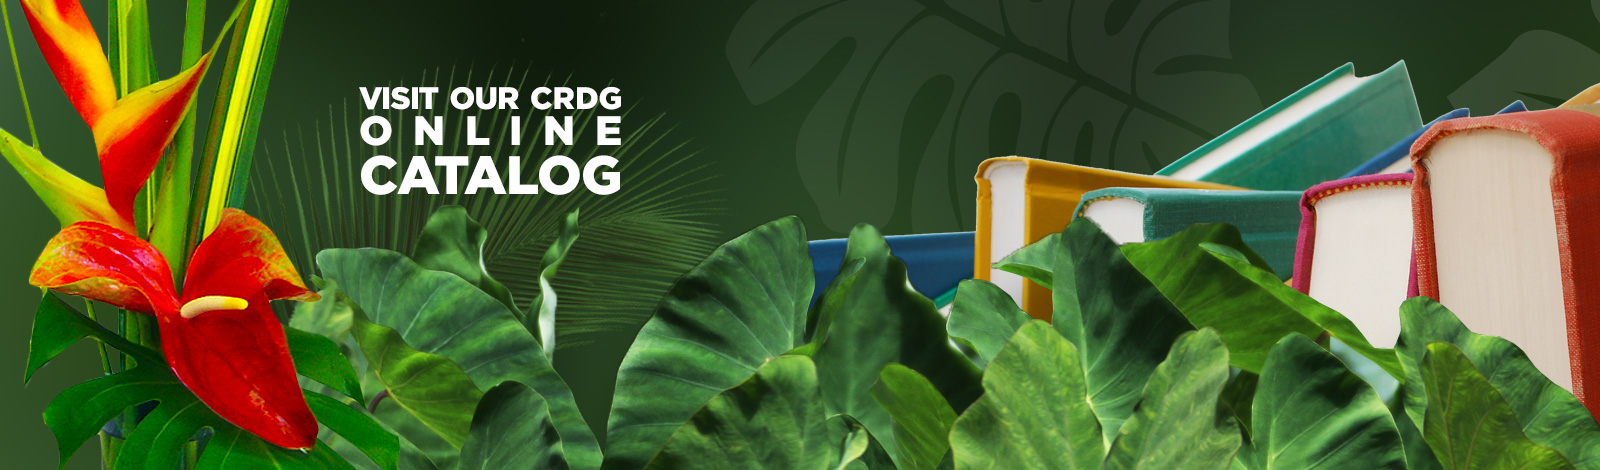 crdg online catalog